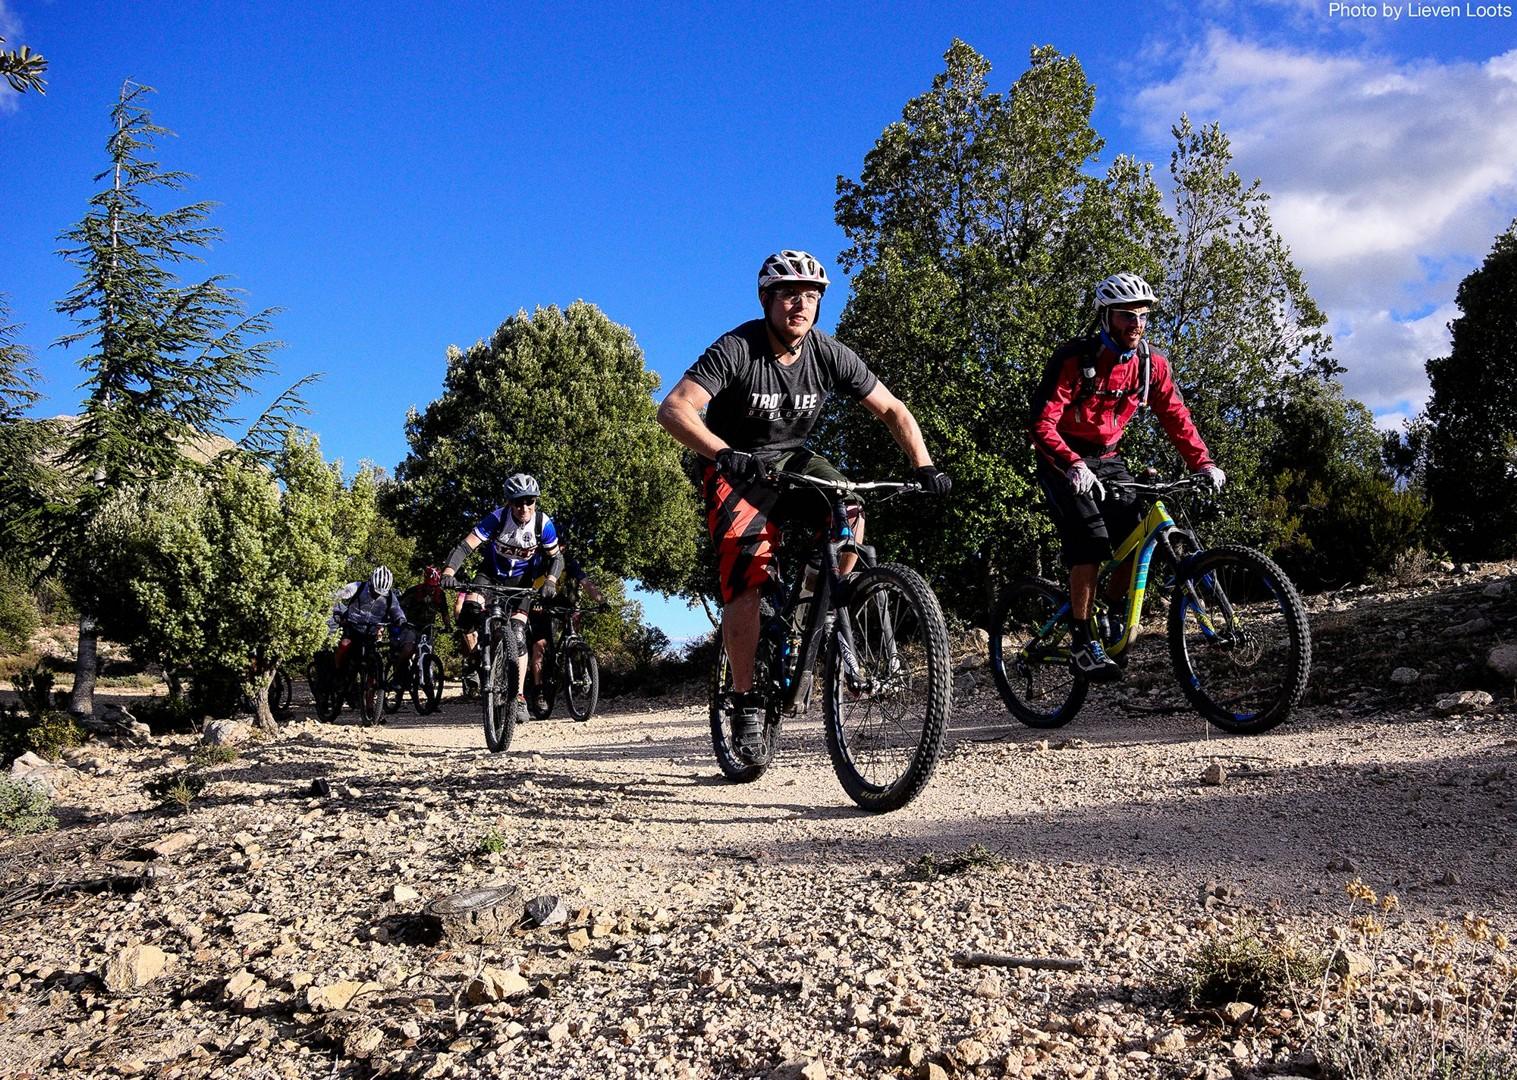 mountain-biking-holiday-in-sardinia-traverse.jpg - Sardinia - Sardinia Traverse - Guided Mountain Bike Holiday - Mountain Biking